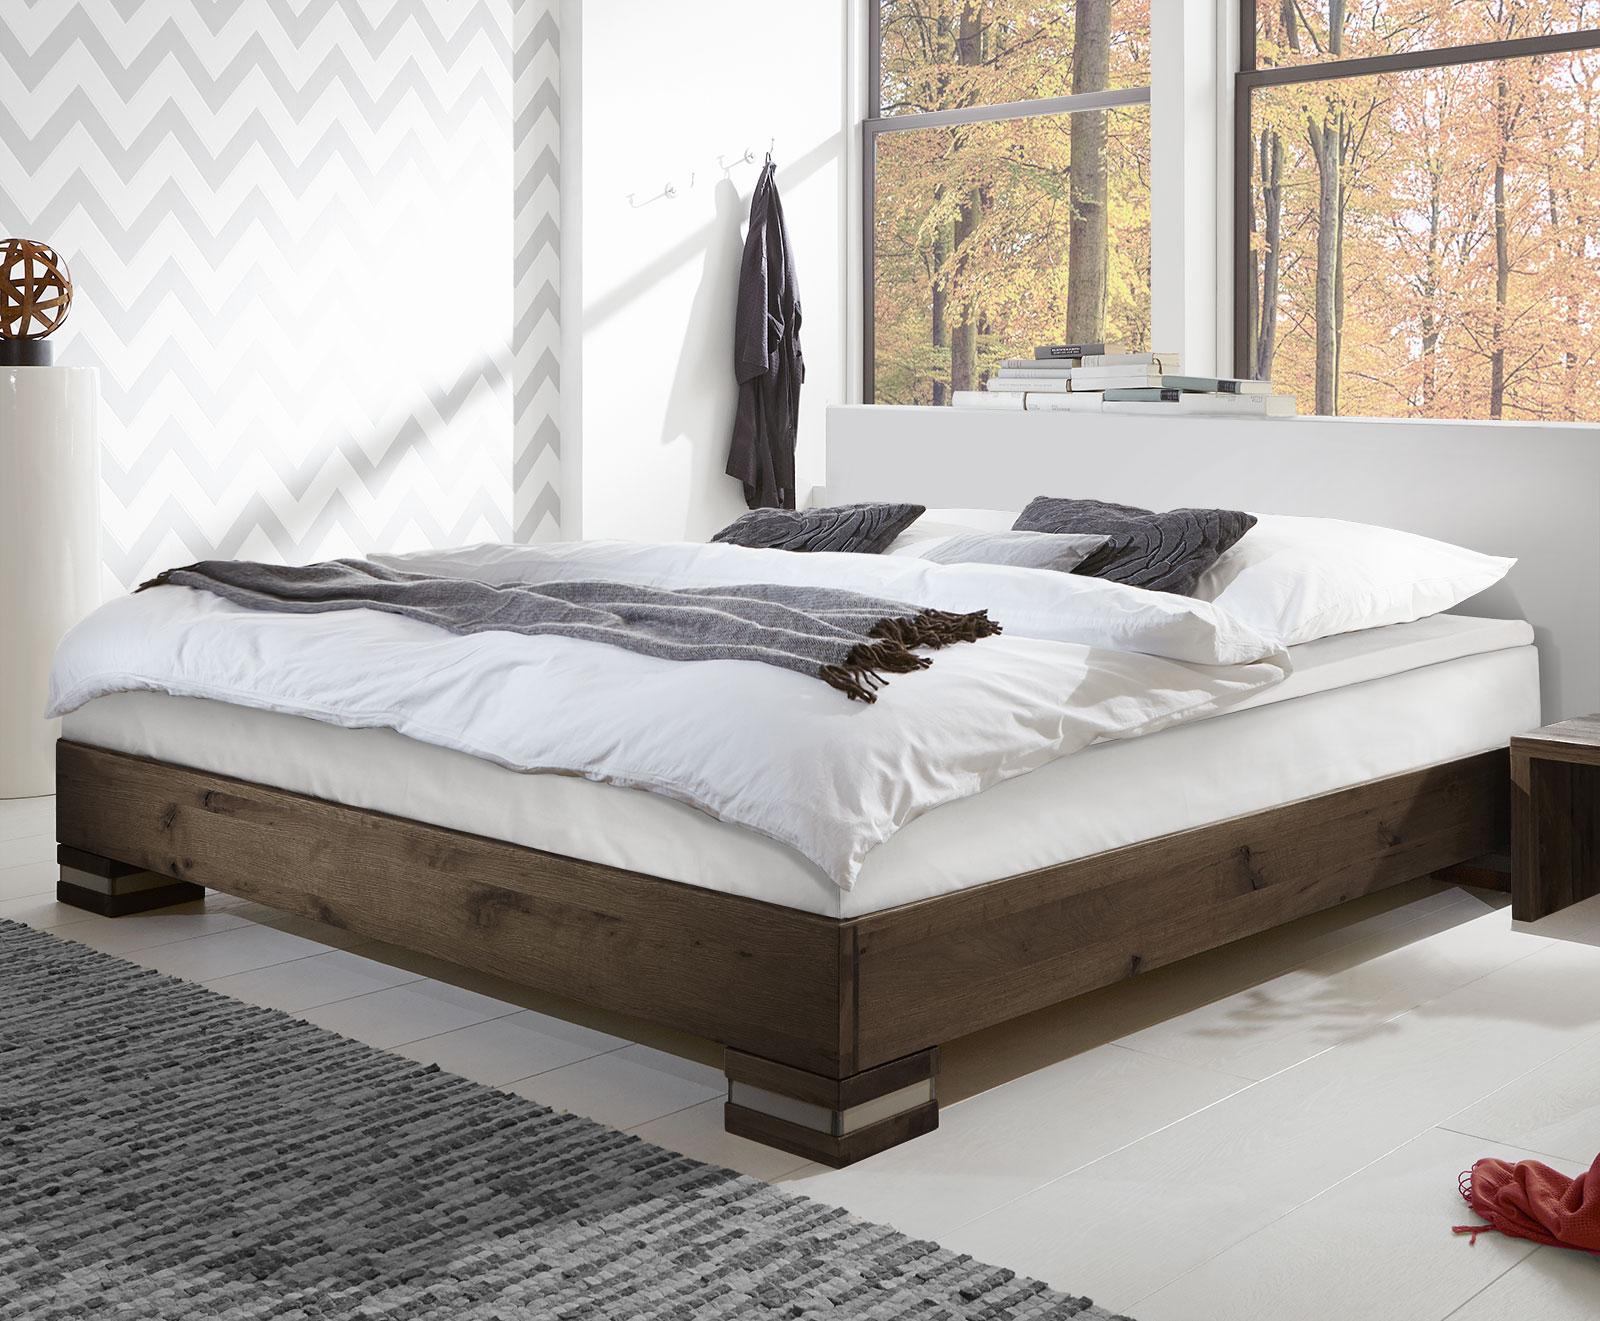 boxspringbett aus holz boxspringbett holz wei boxspringbett aus holz haus dekoration. Black Bedroom Furniture Sets. Home Design Ideas